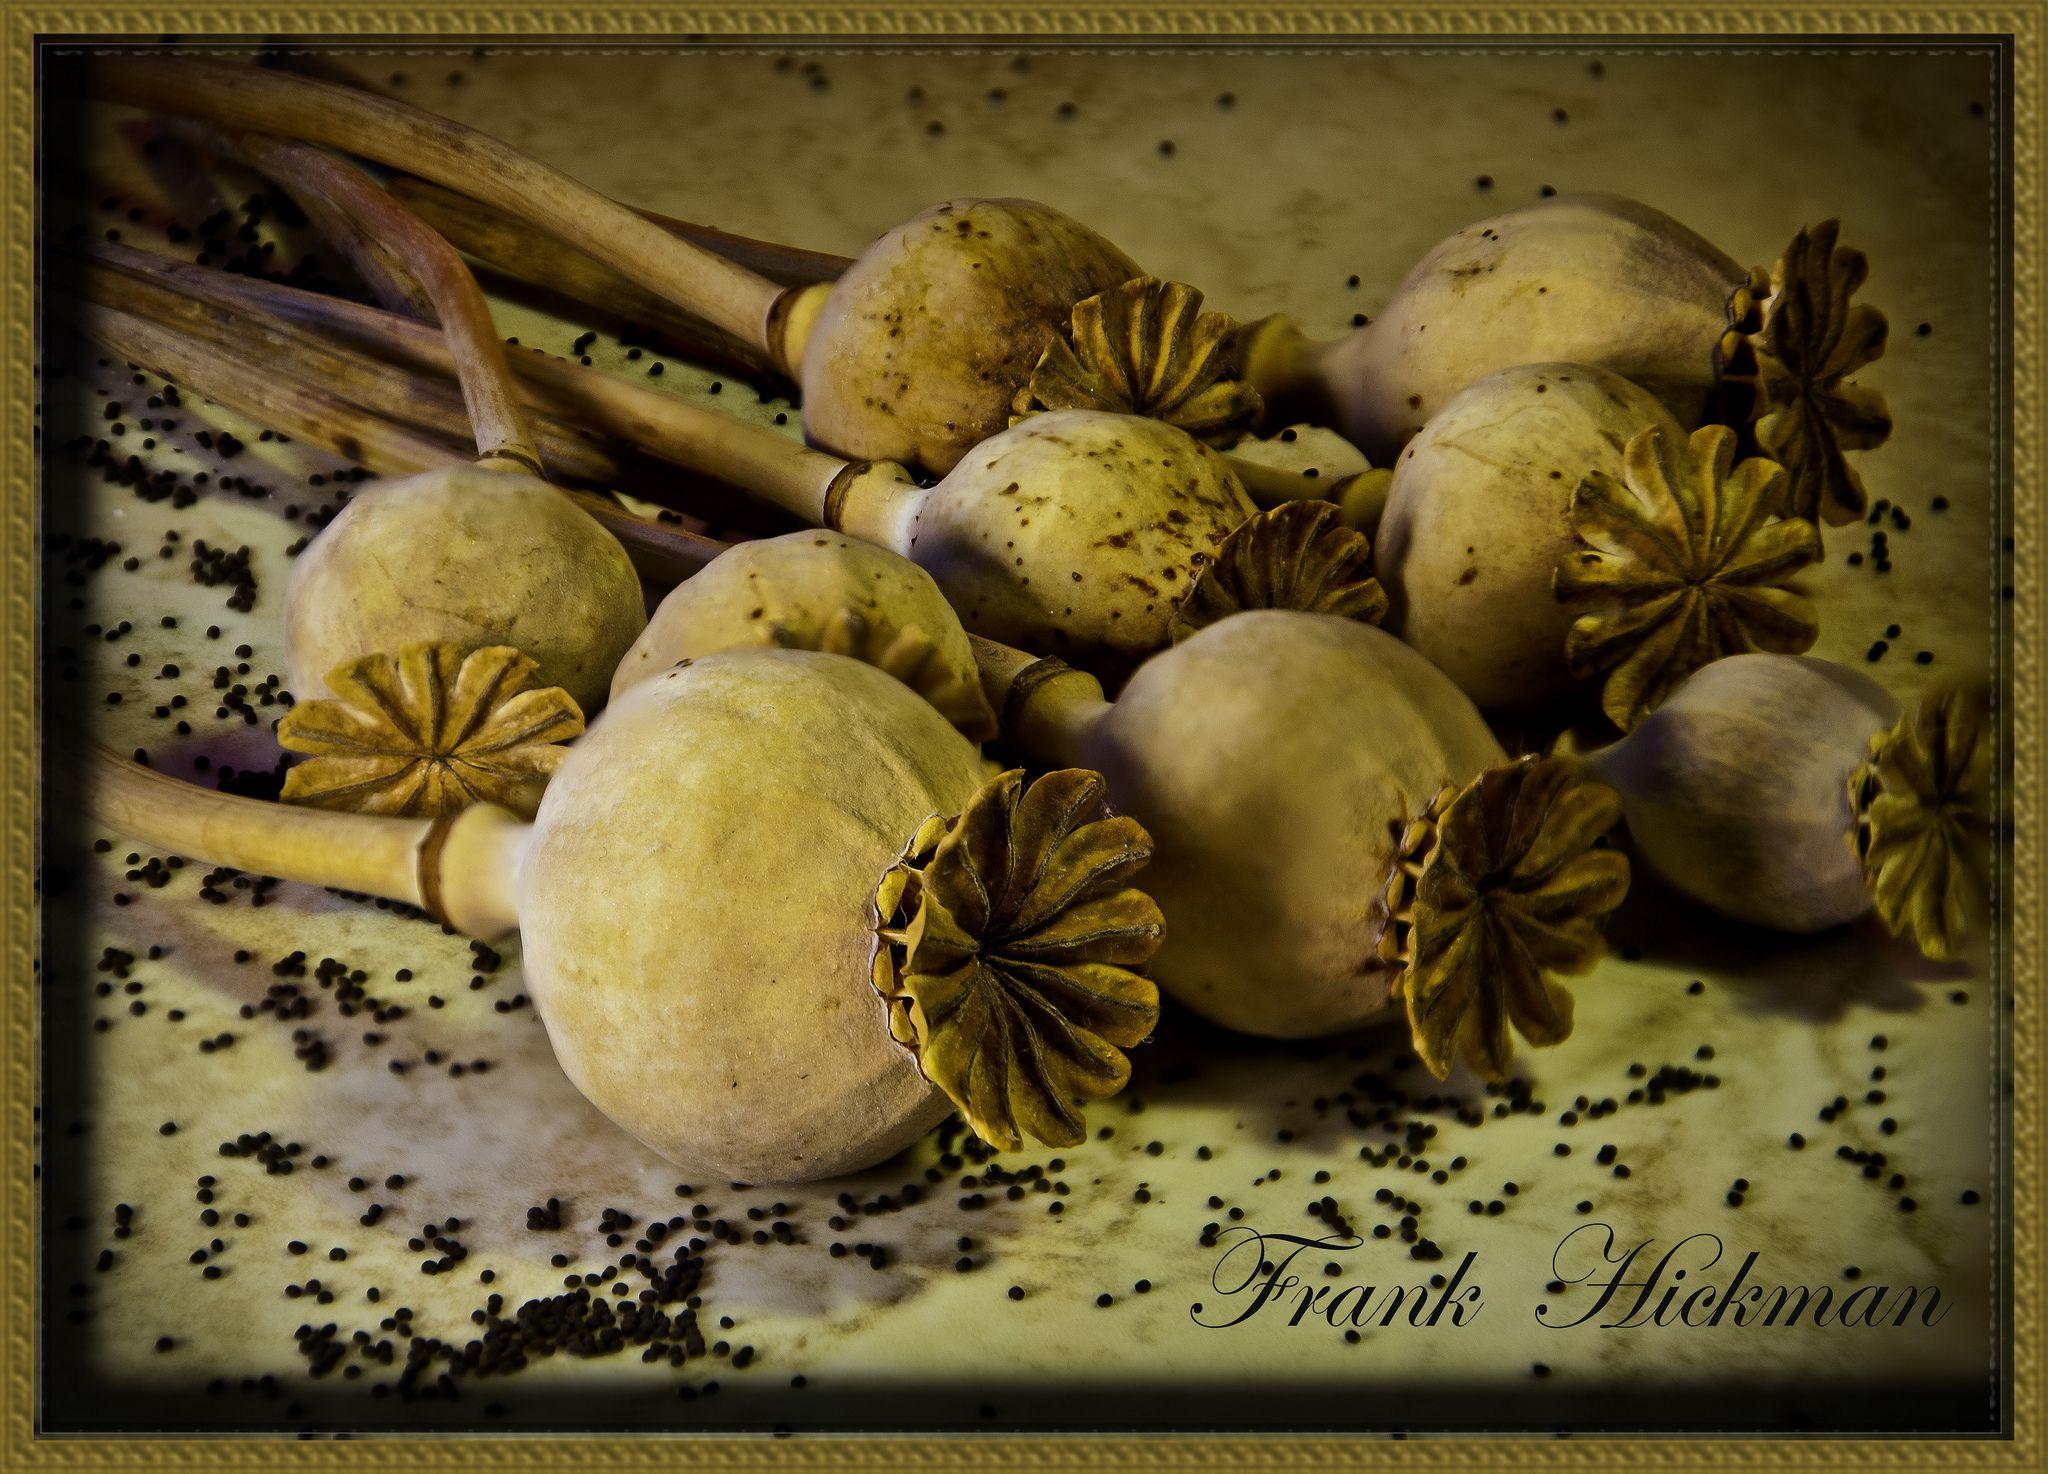 Poppy seeds  ready  2014 / Photo: Frank Hickman on Flickr